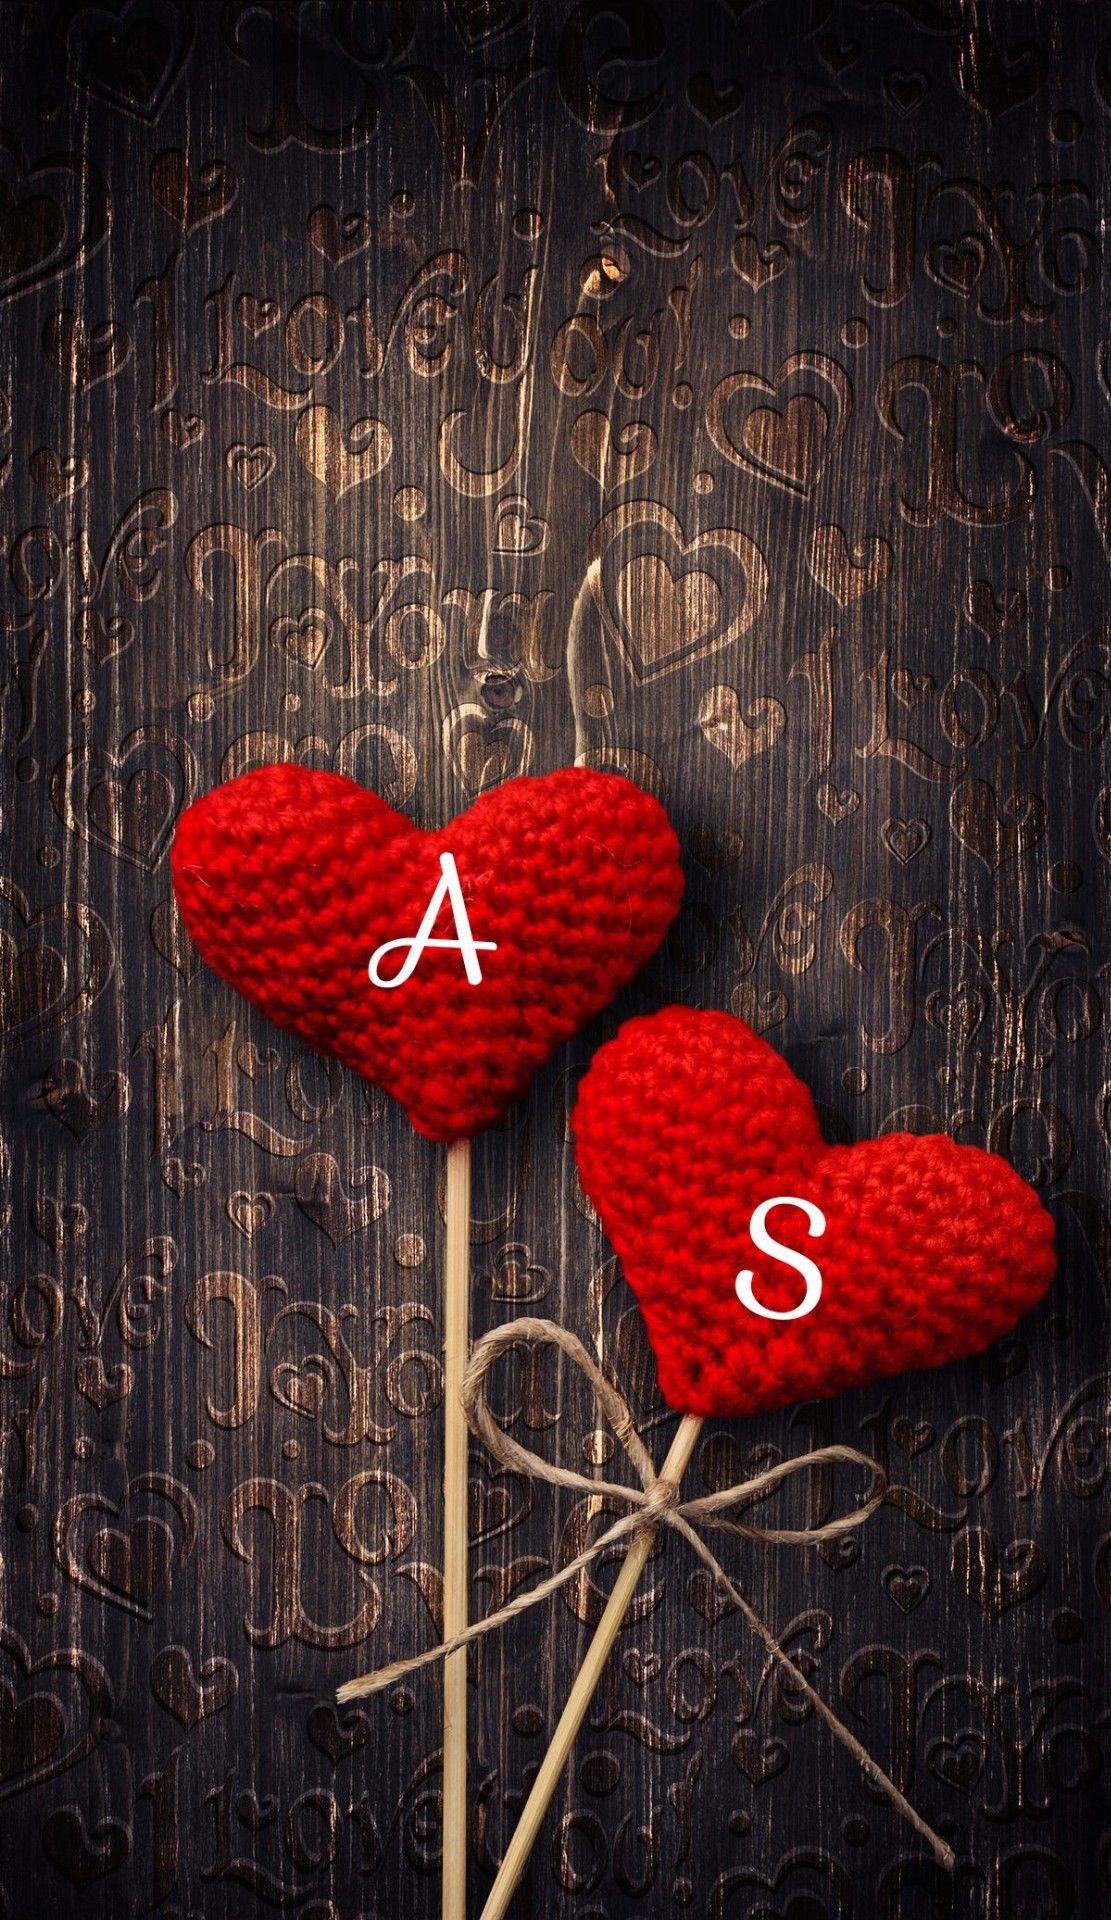 Pin By Ananya Srivastav On True Love Love Couple Wallpaper Love Wallpaper Backgrounds Cute Love Wallpapers